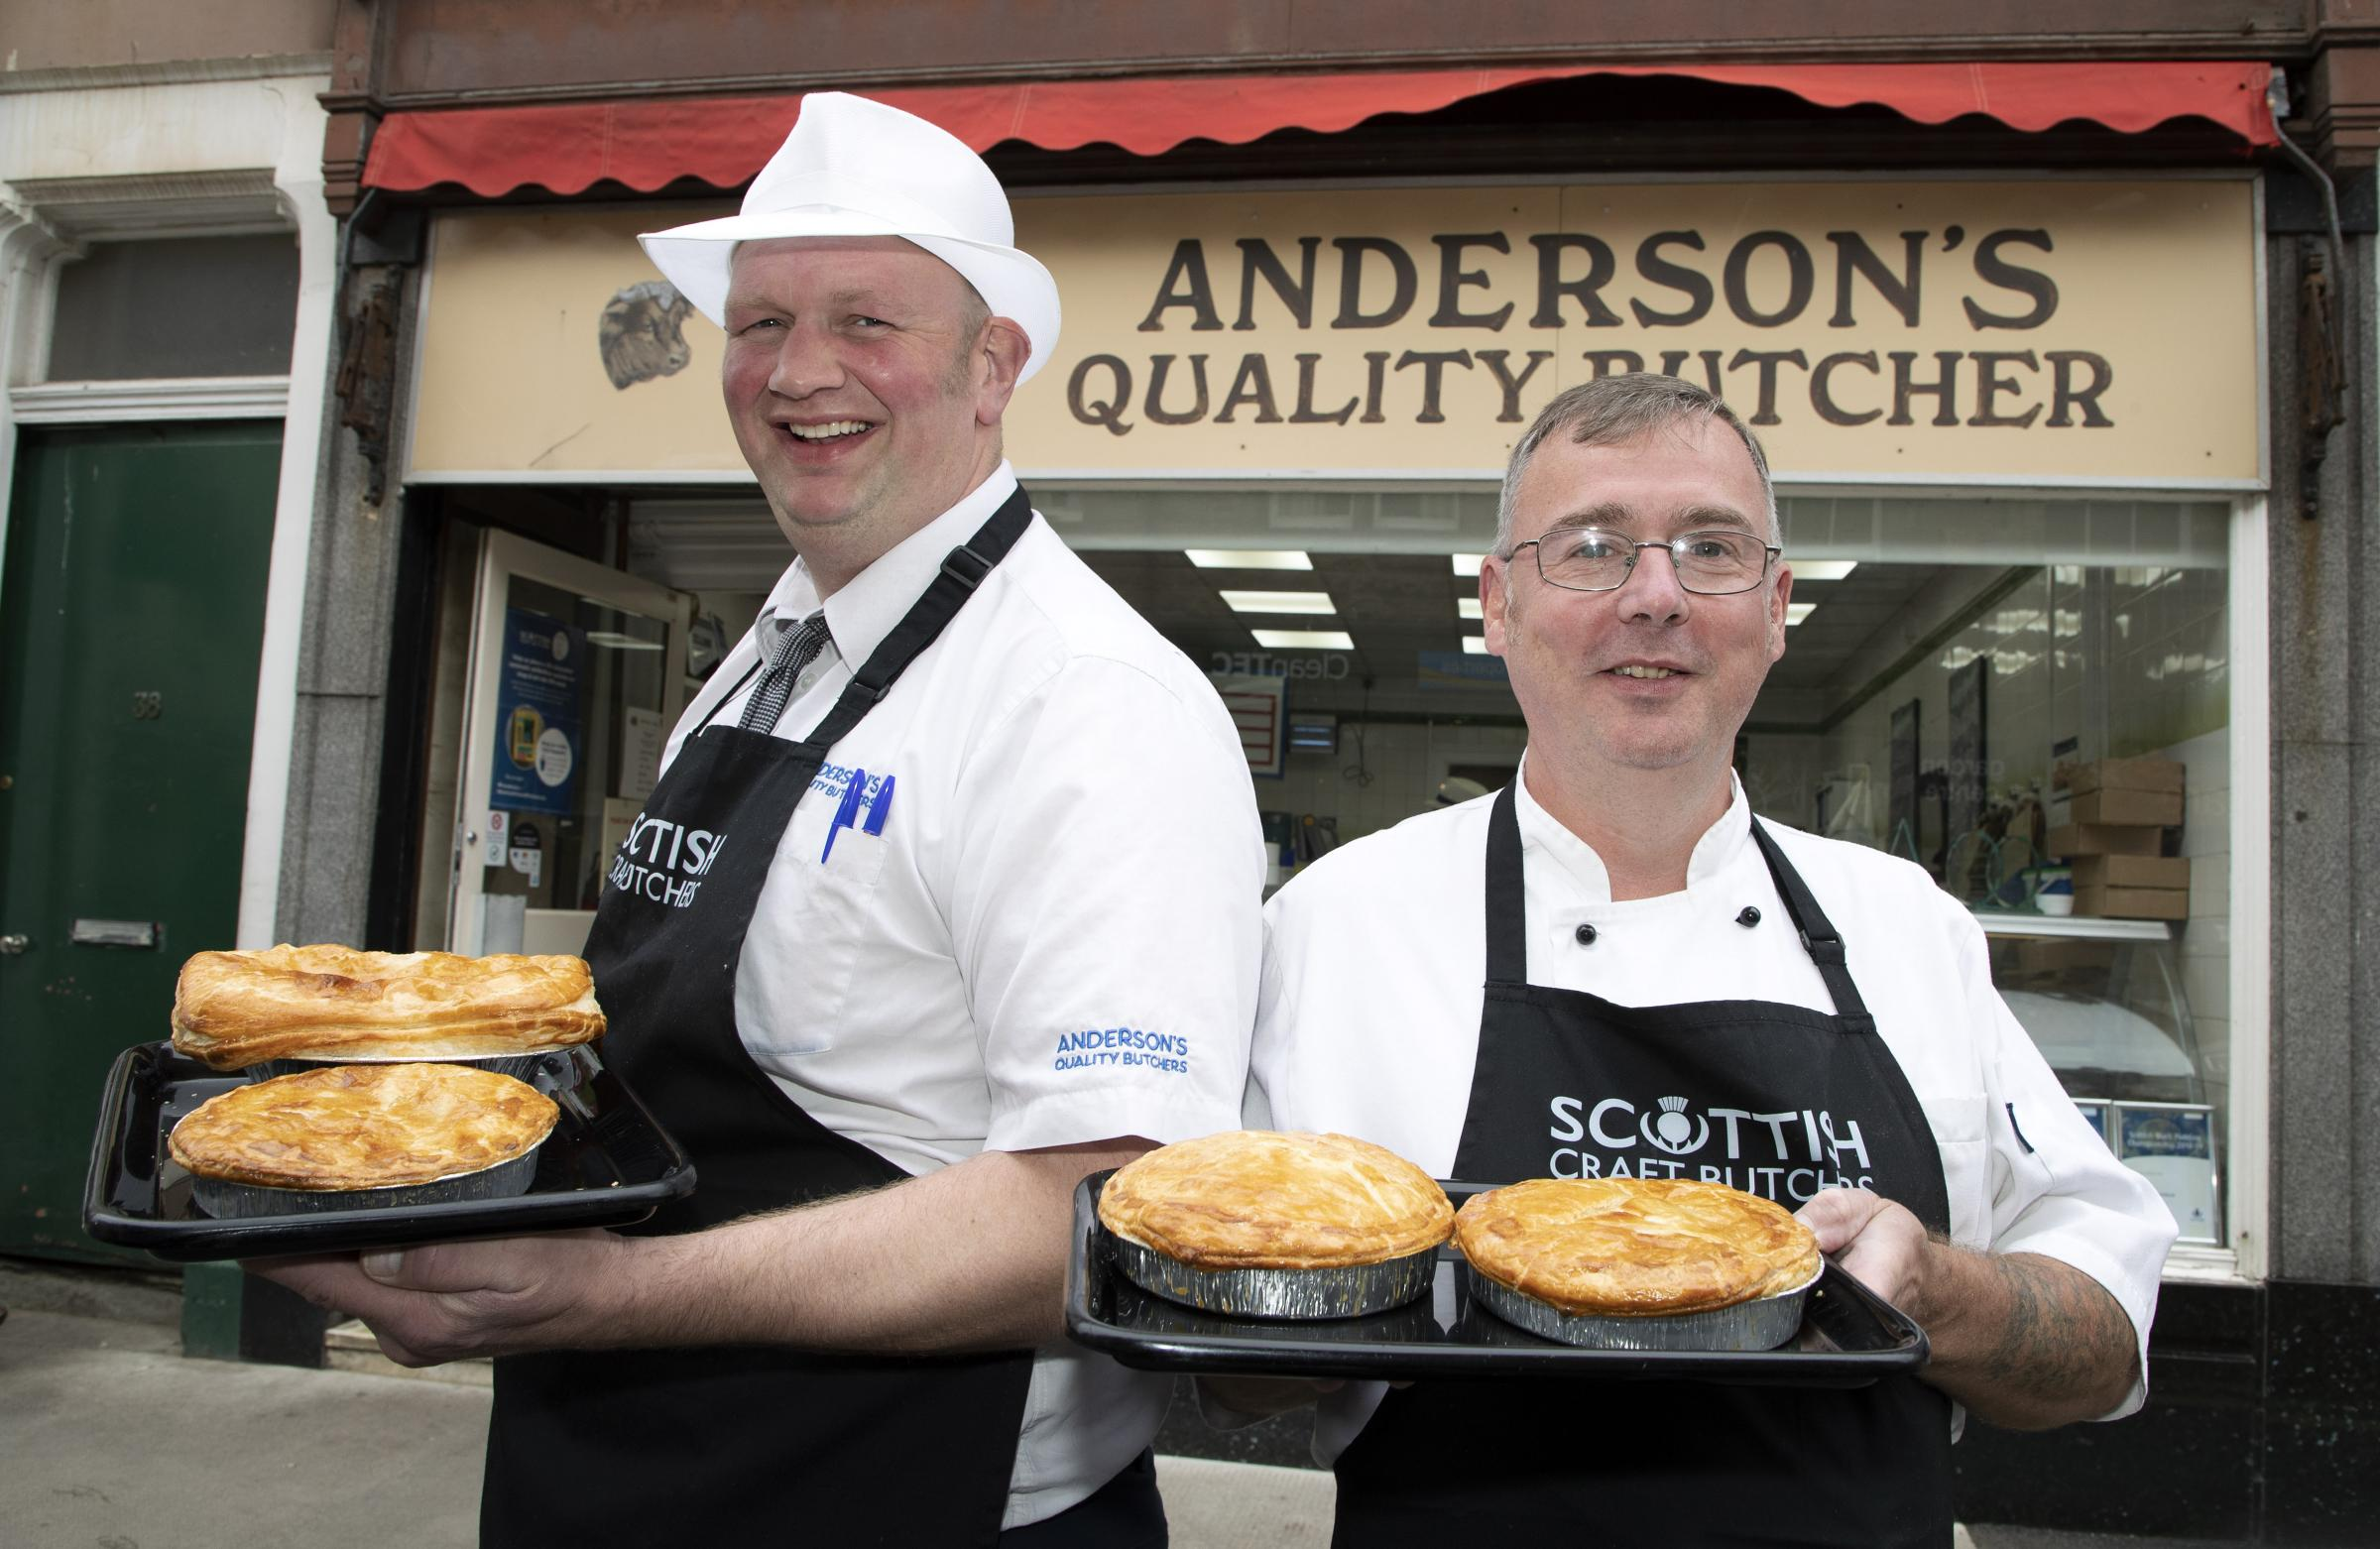 North Berwick butchers' venison pie named the best in Scotland